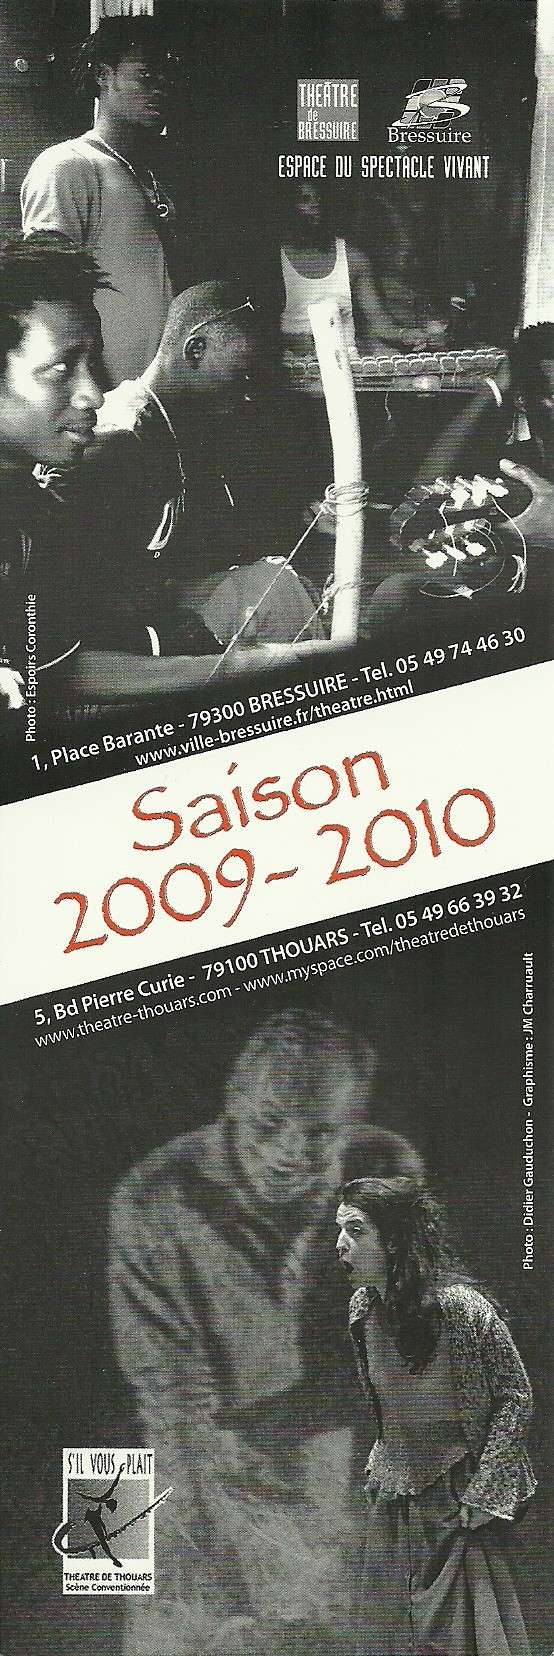 Doubles d'Alain Numari85